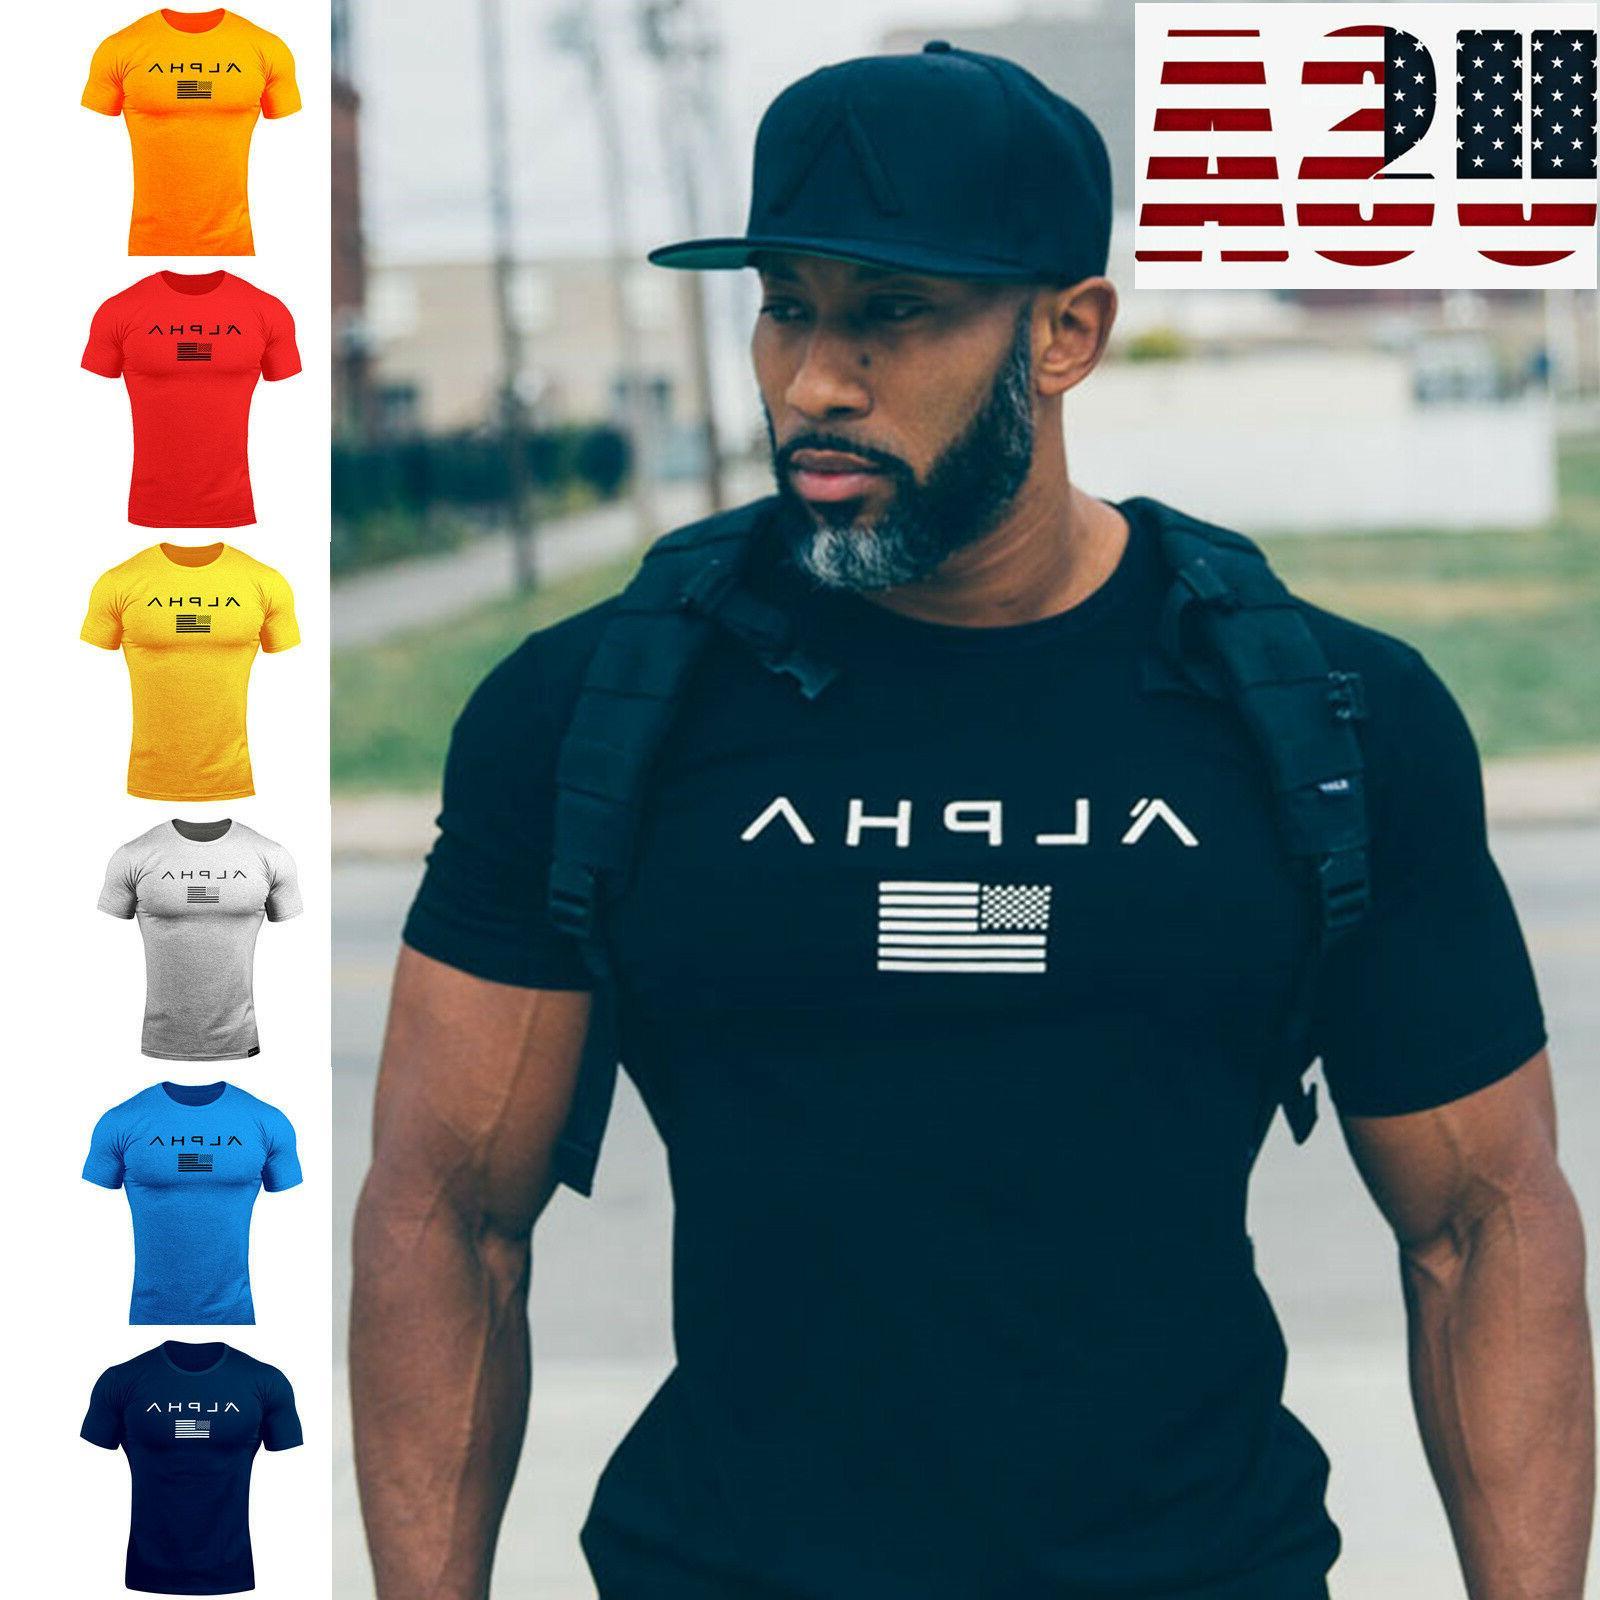 alpha men gym t shirt bodybuilding fitness